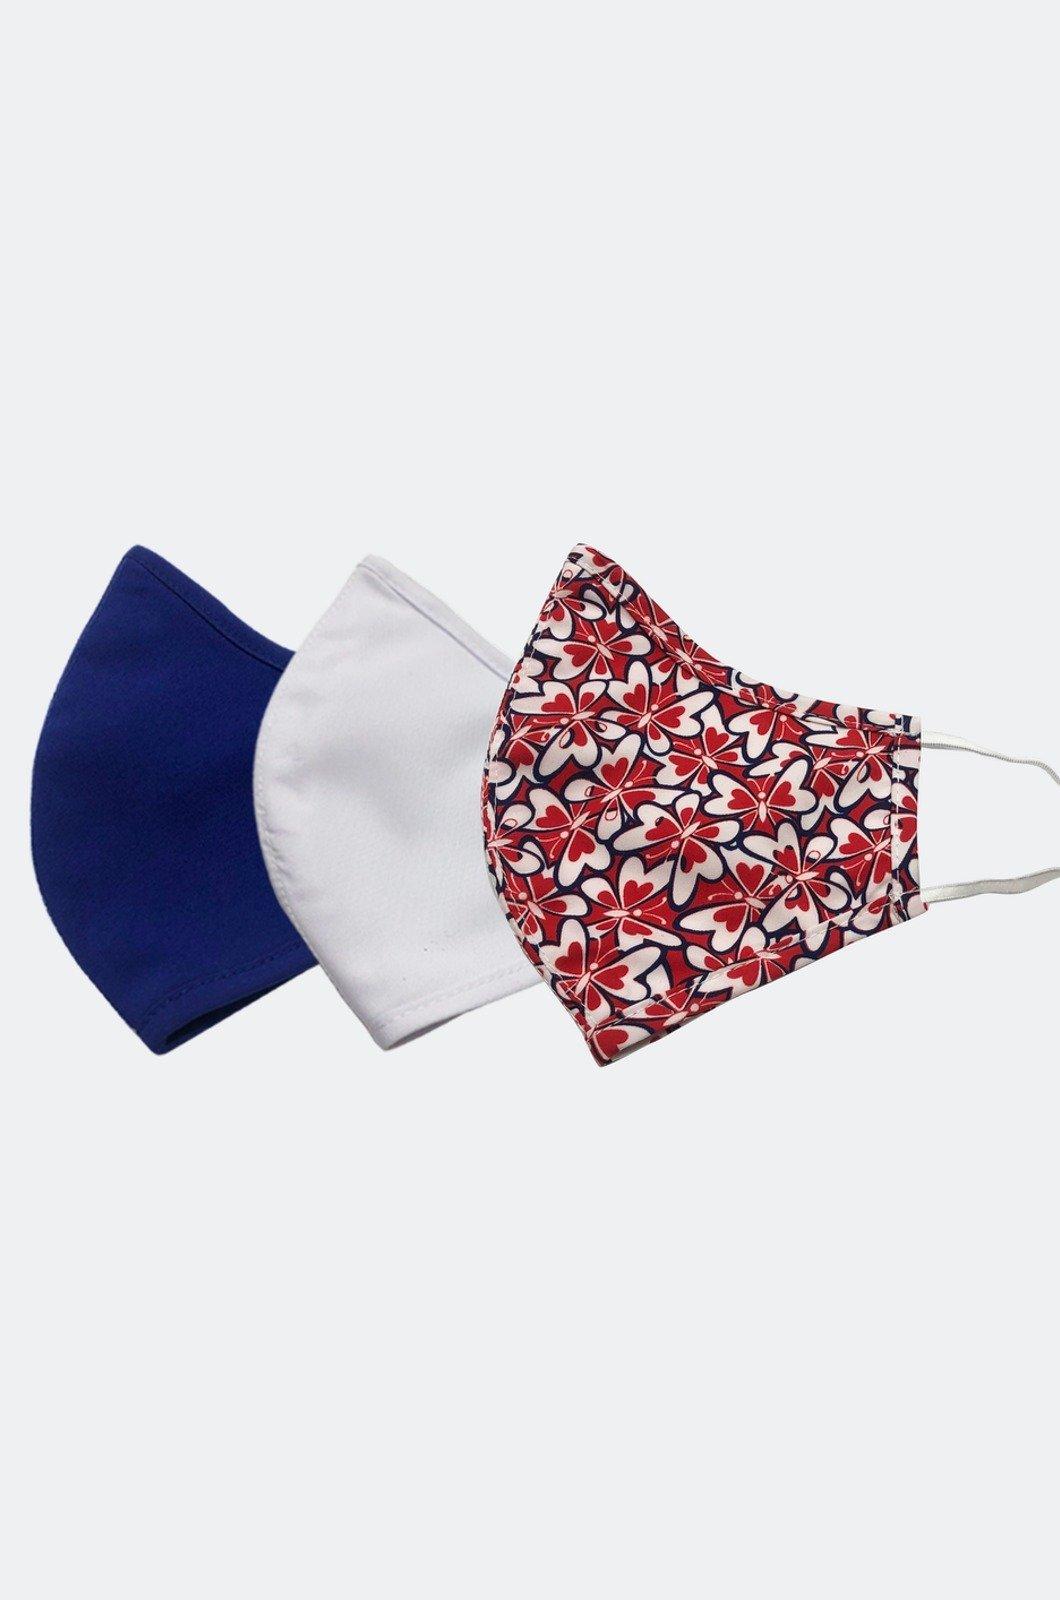 Tapabocas-Kit-floral-Chazari-MA70007-20-KF1